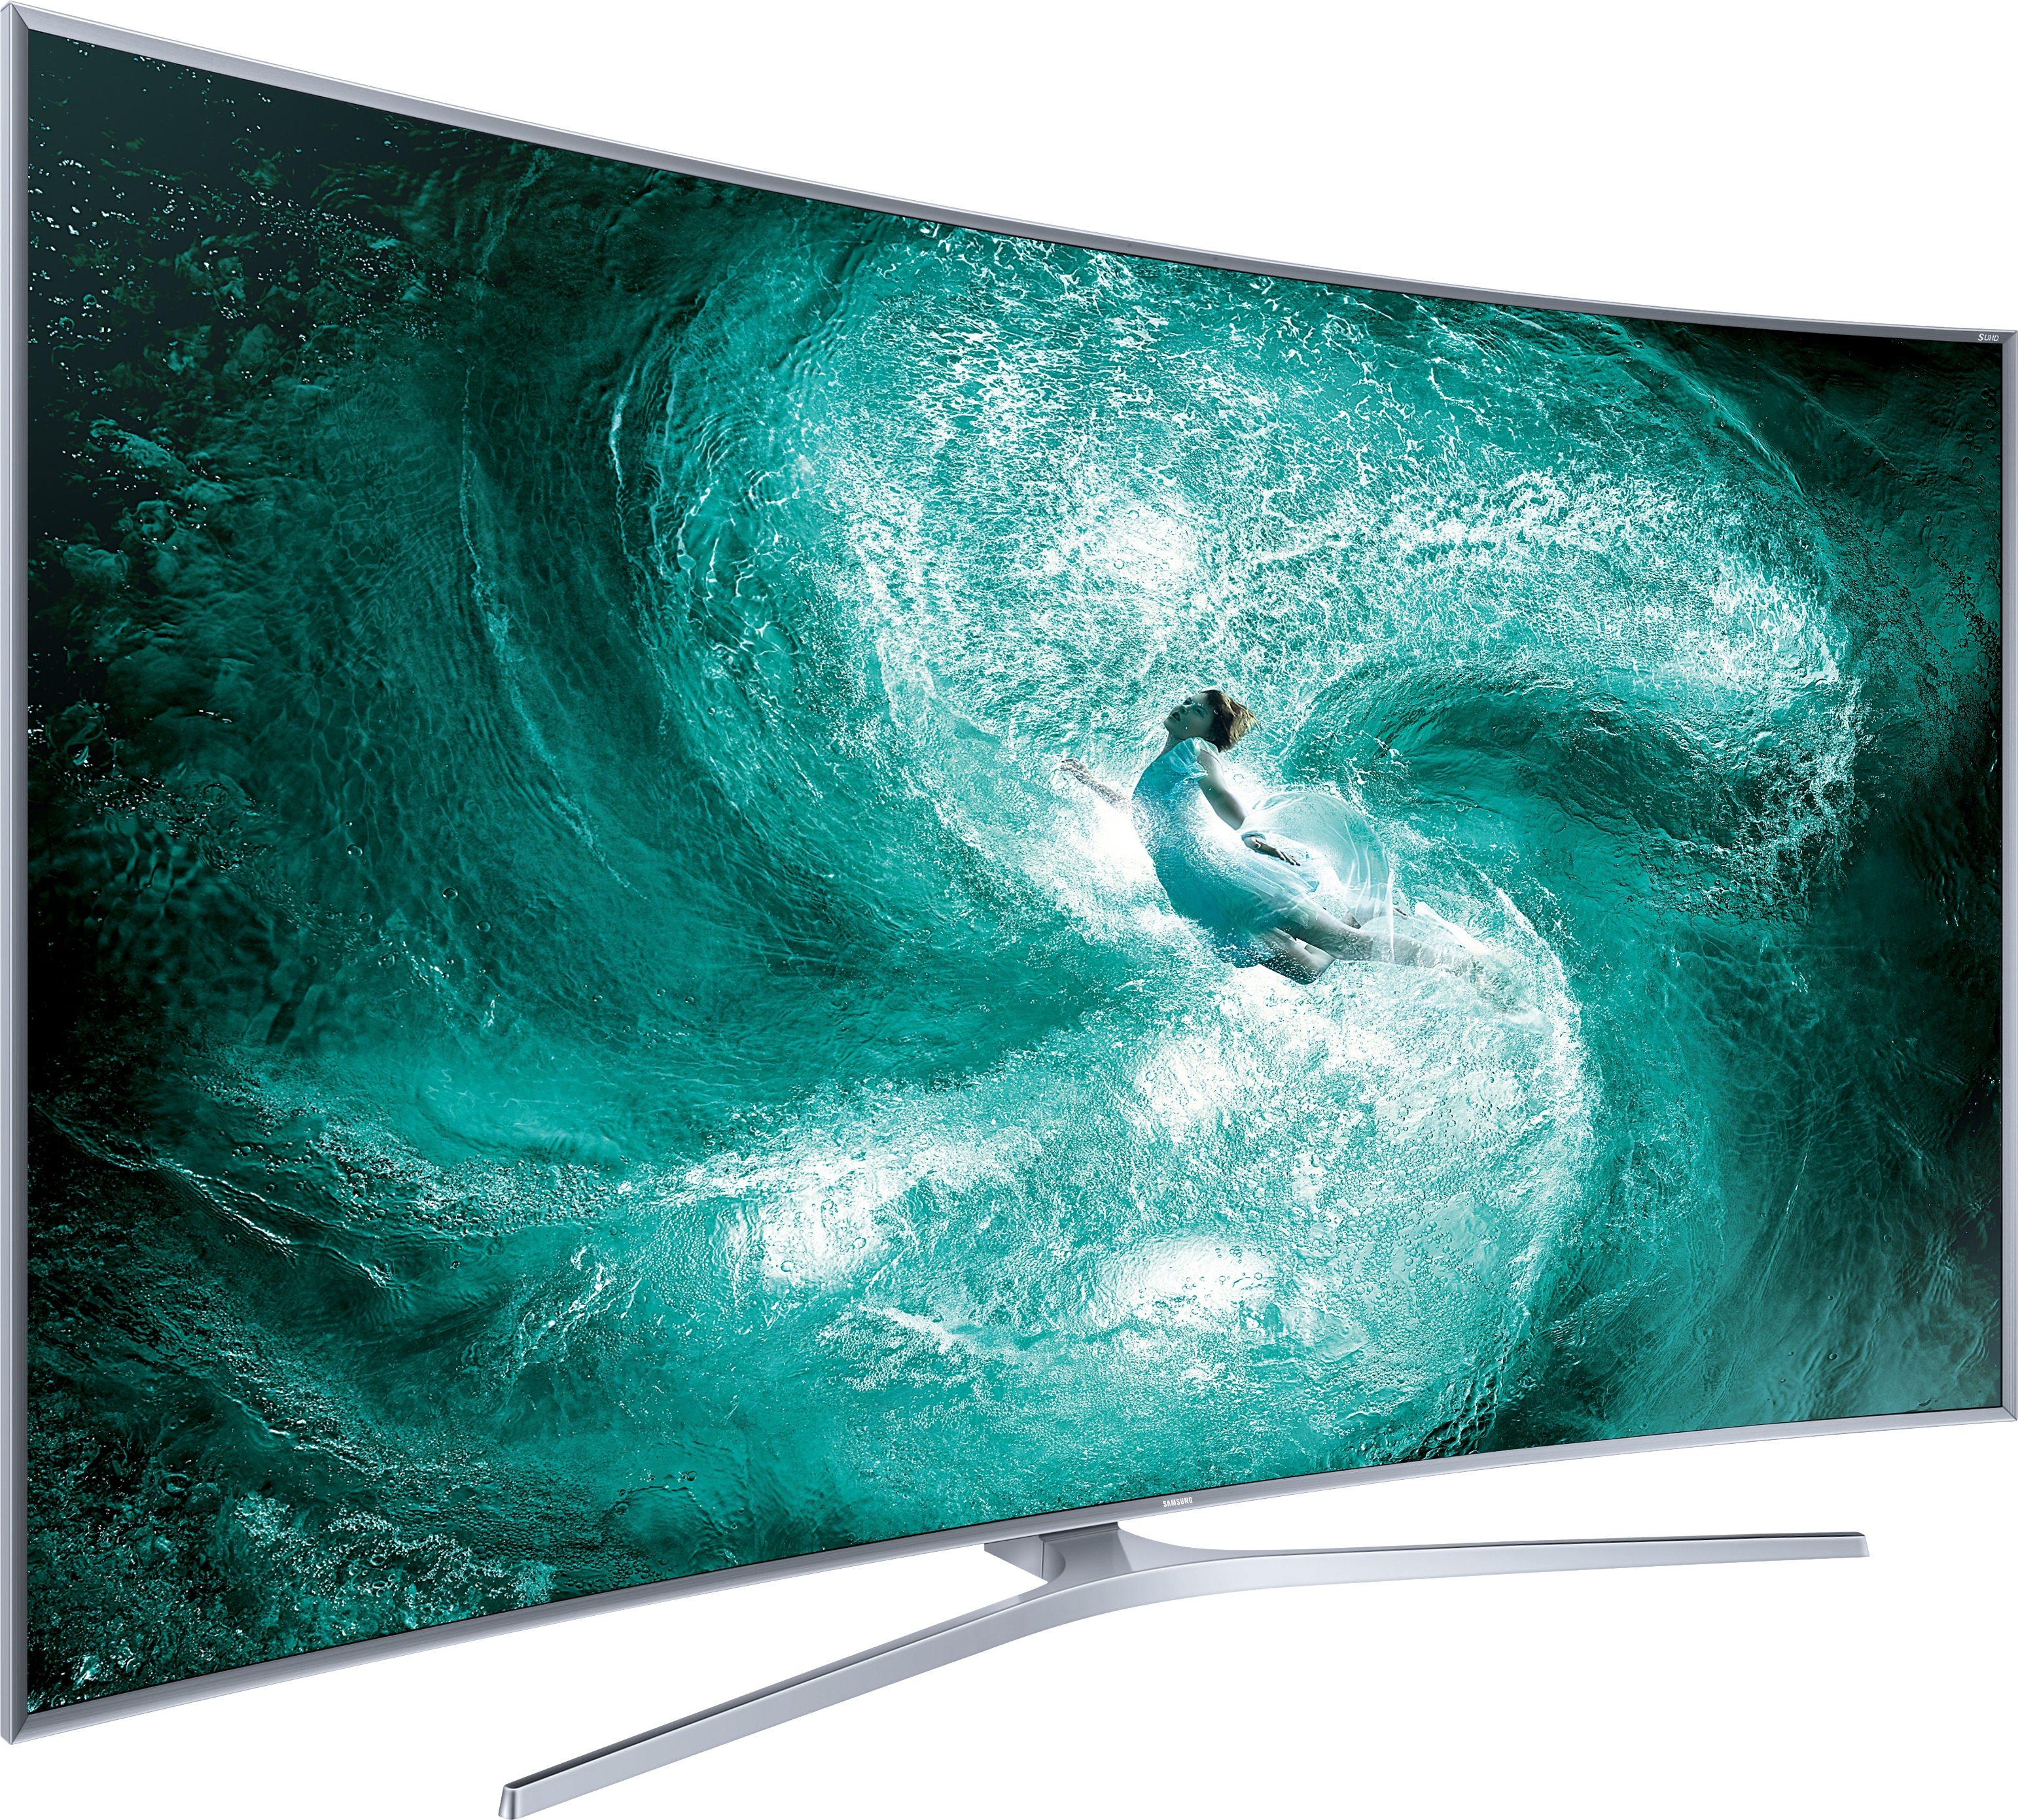 Samsung UE88JS9590QXZG, Curved-LED-Fernseher, 222 cm (88 Zoll), 2160p (SUHD), Smart-TV